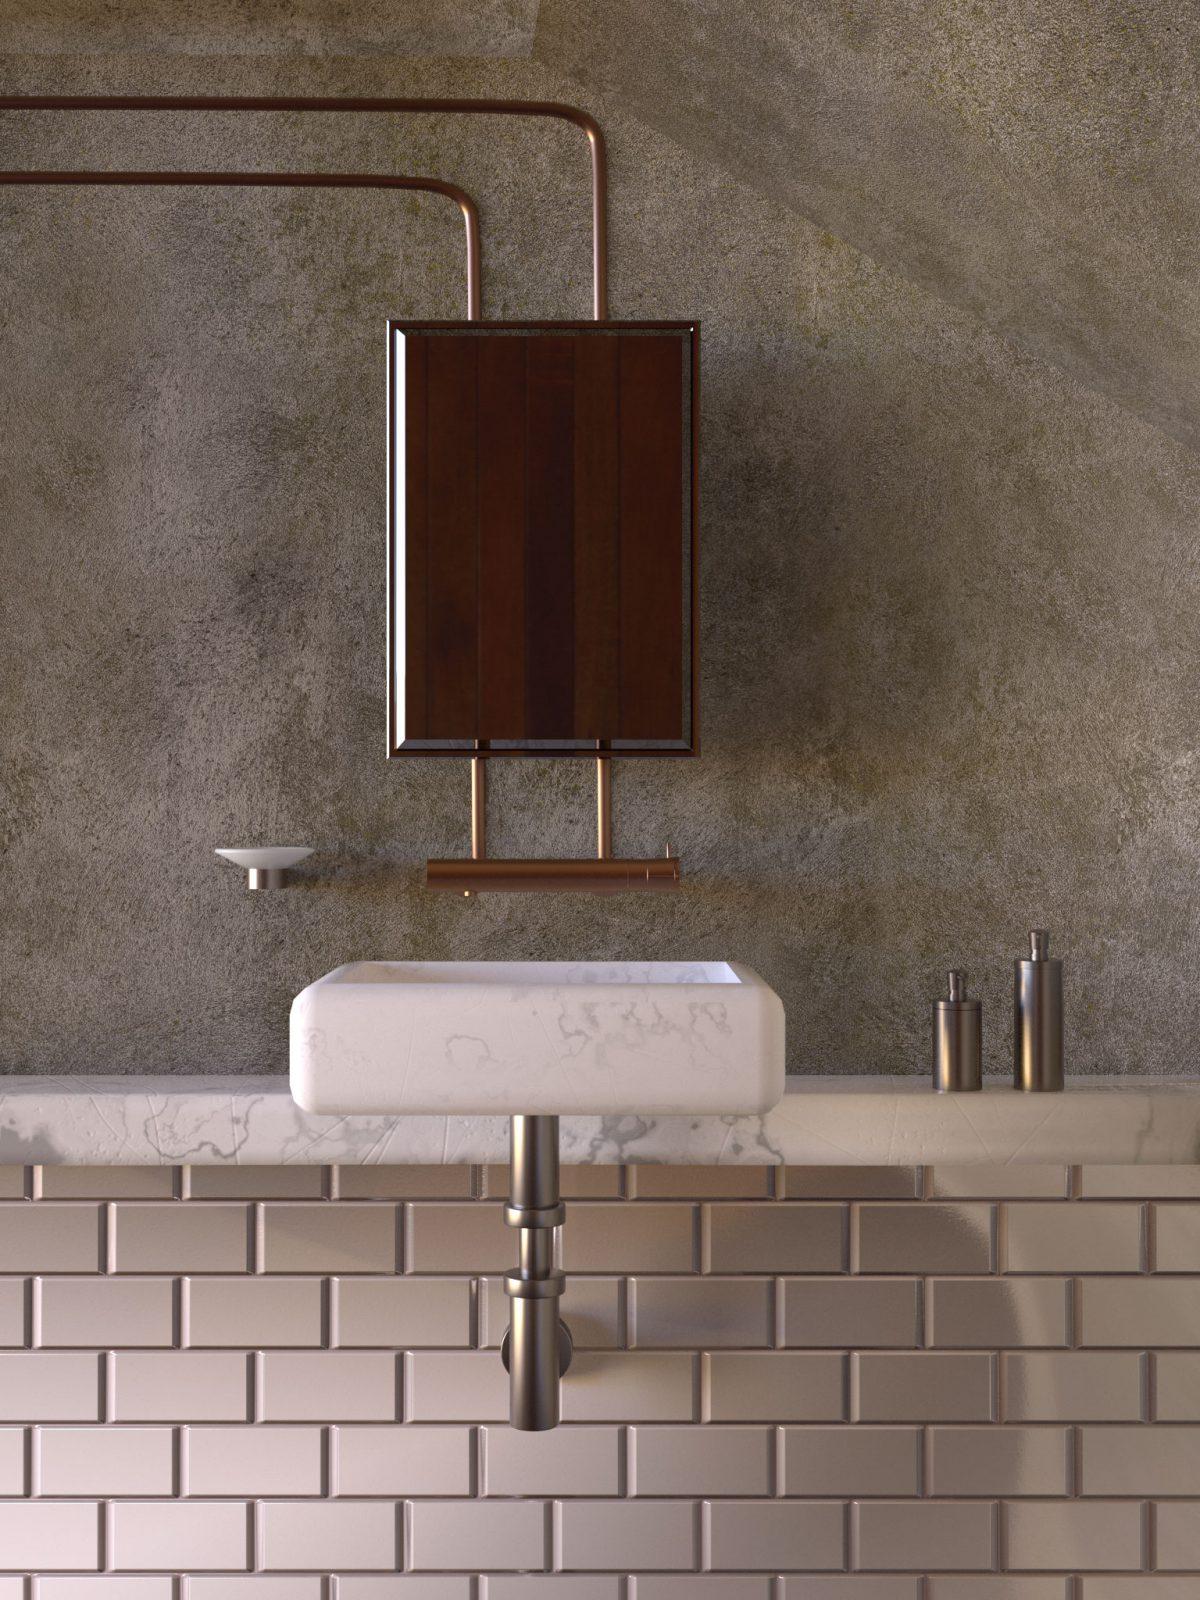 Interior Bathroom 3D Render